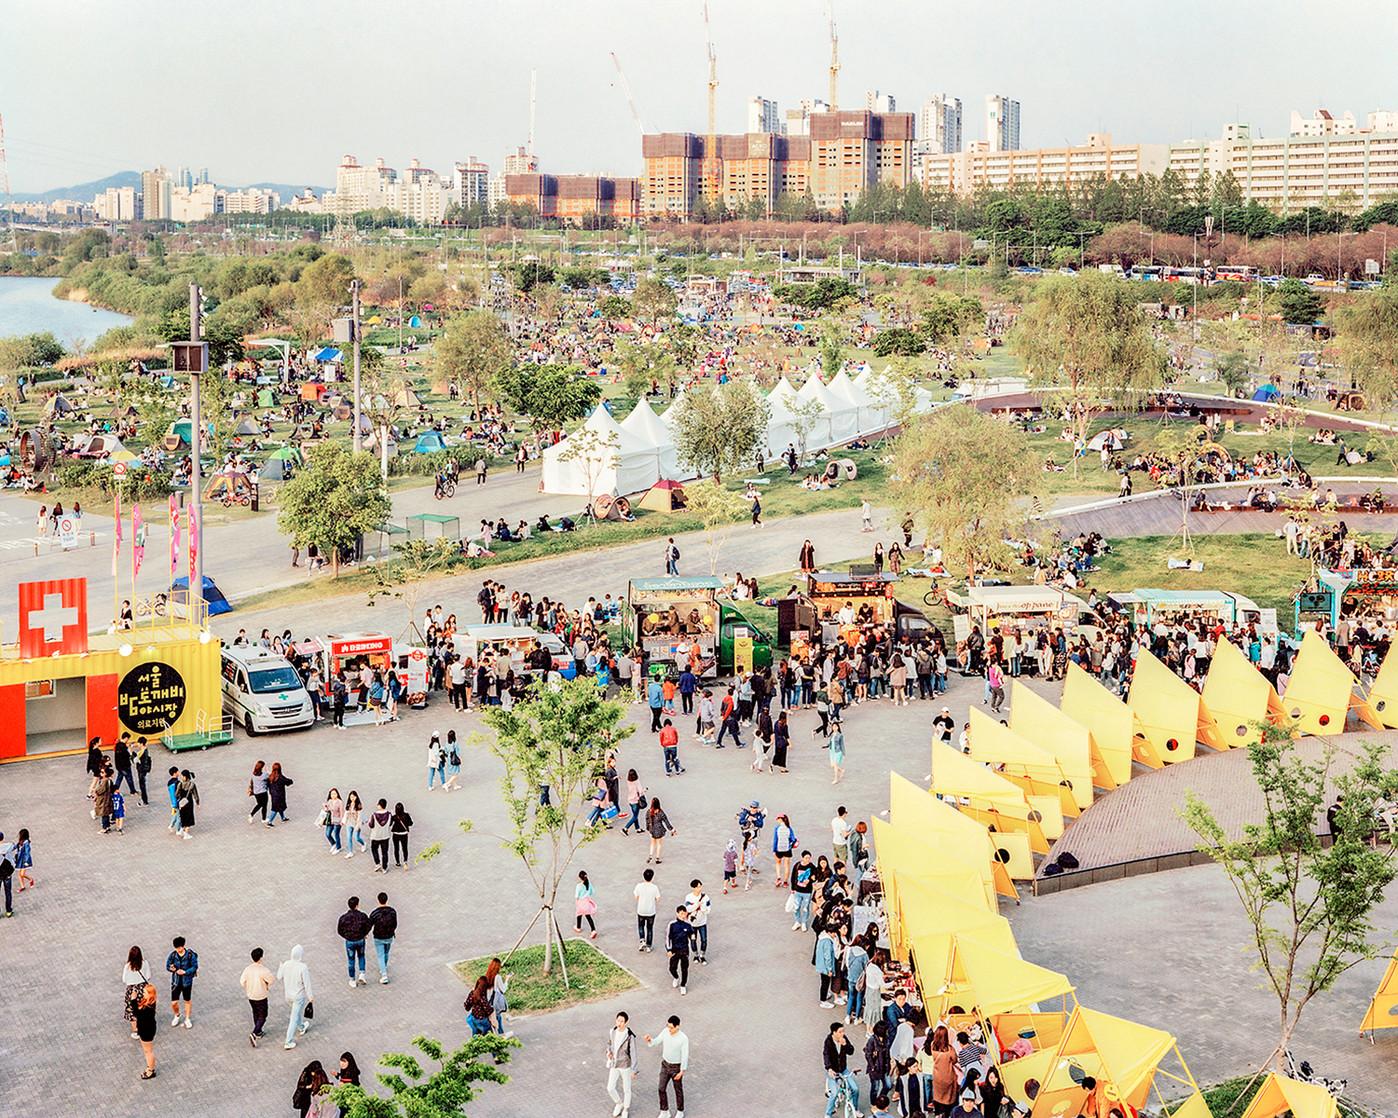 Bamdokkaebi Market, Seoul, May 2016